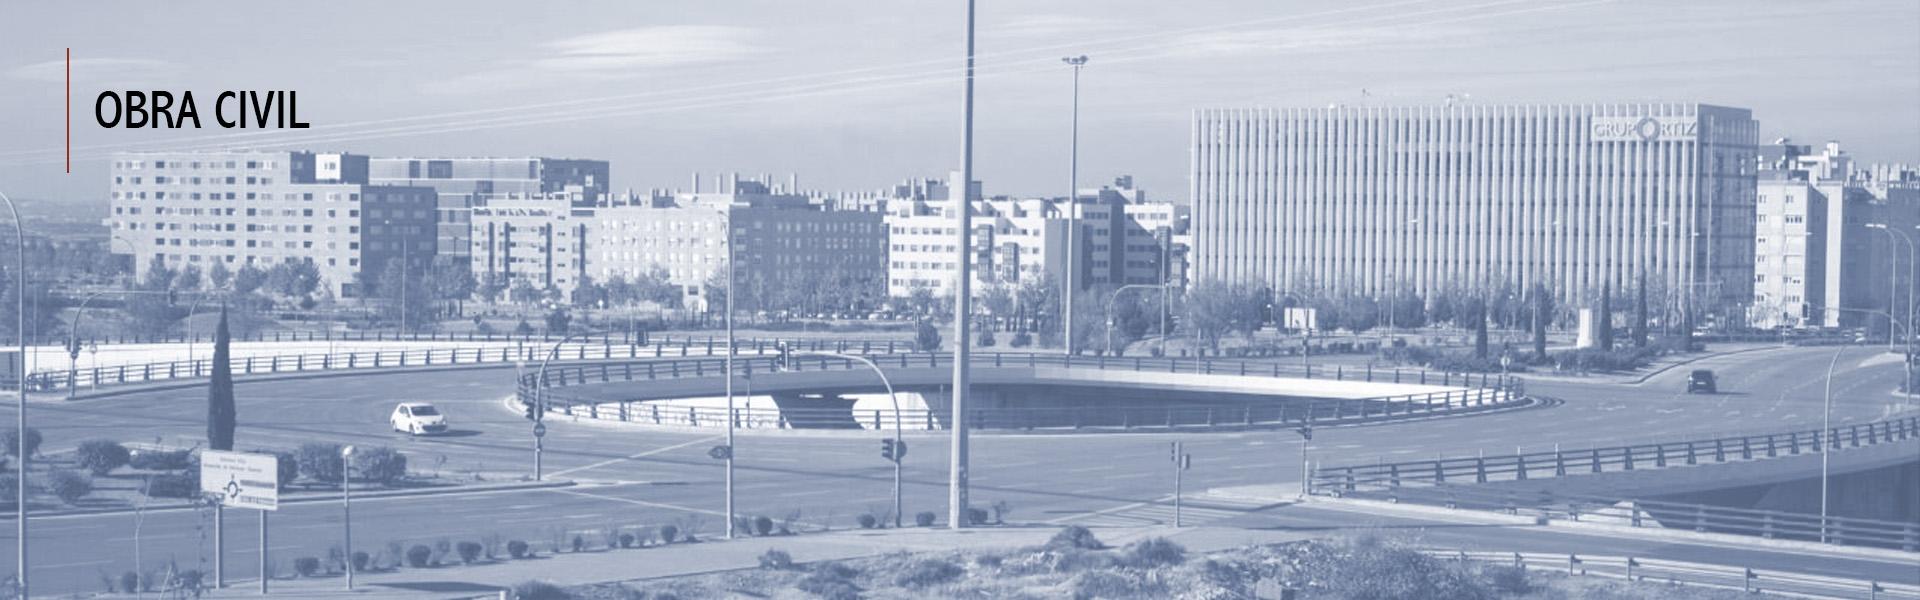 Madrid - Puente-rotonda sobre la carretera M45